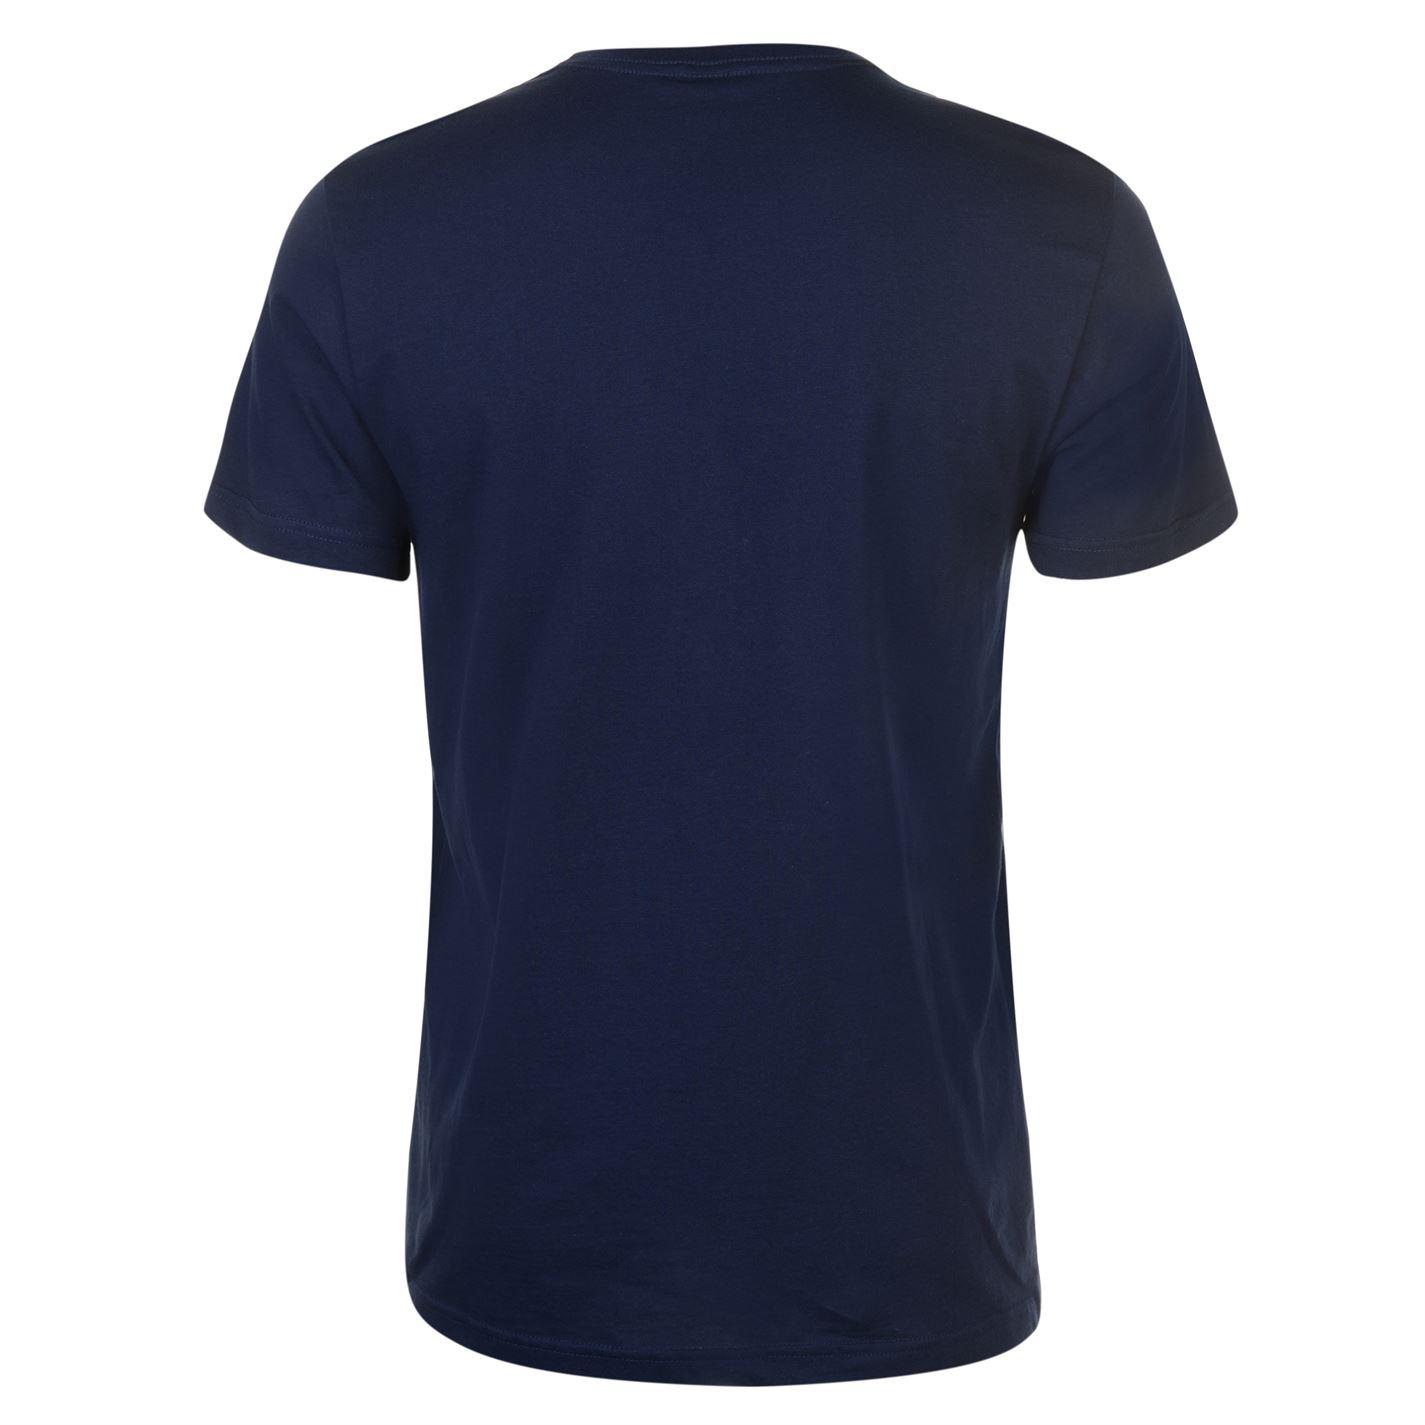 93454331f23c adidas Foil Logo T Shirt Mens Gents Crew Neck Tee Top Short Sleeve ...